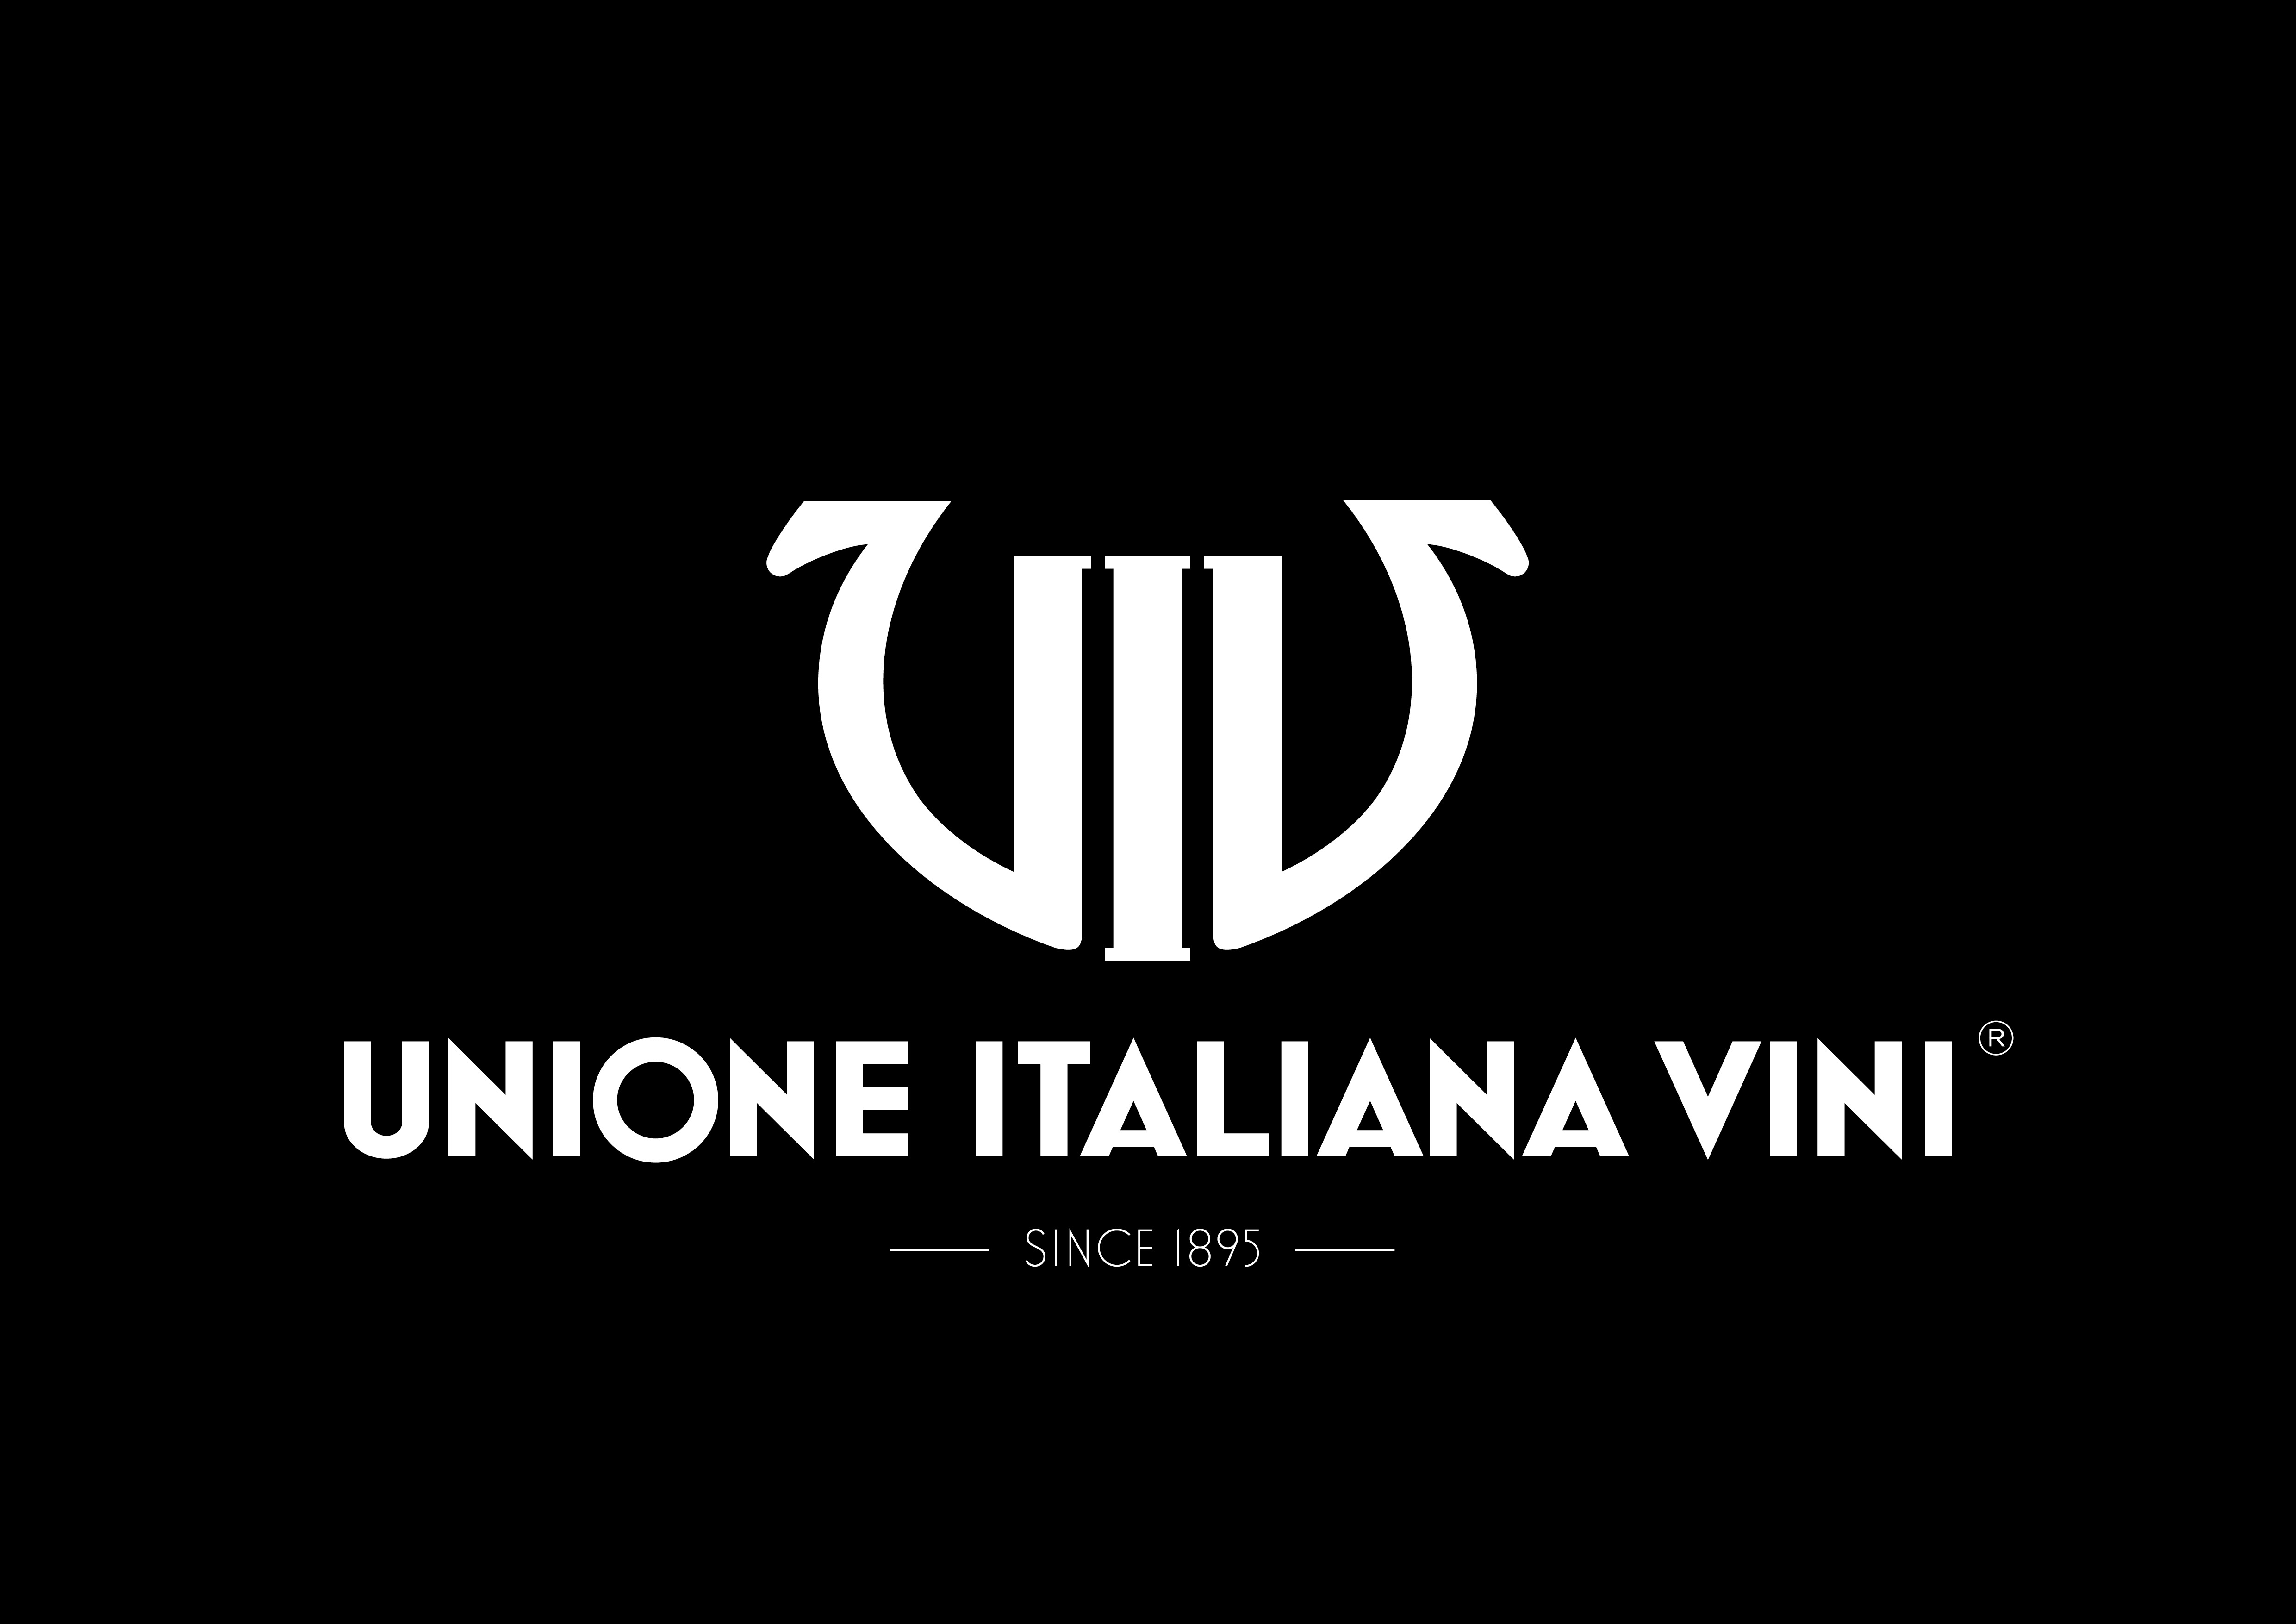 Unione Italiana Vini